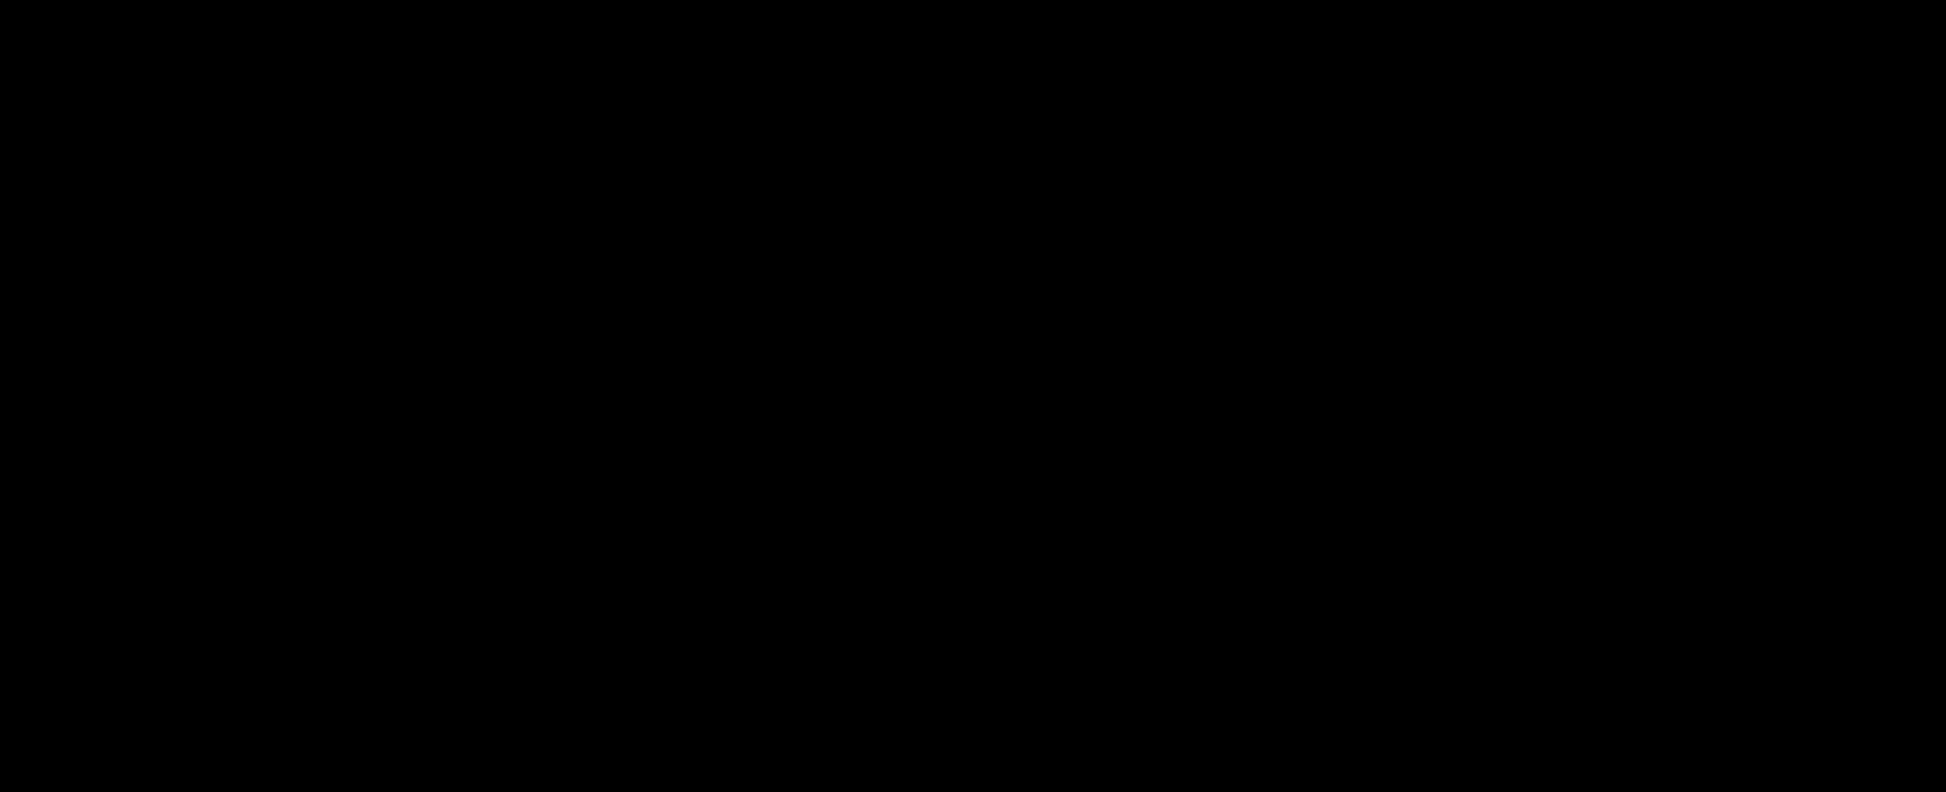 AGESTOCK